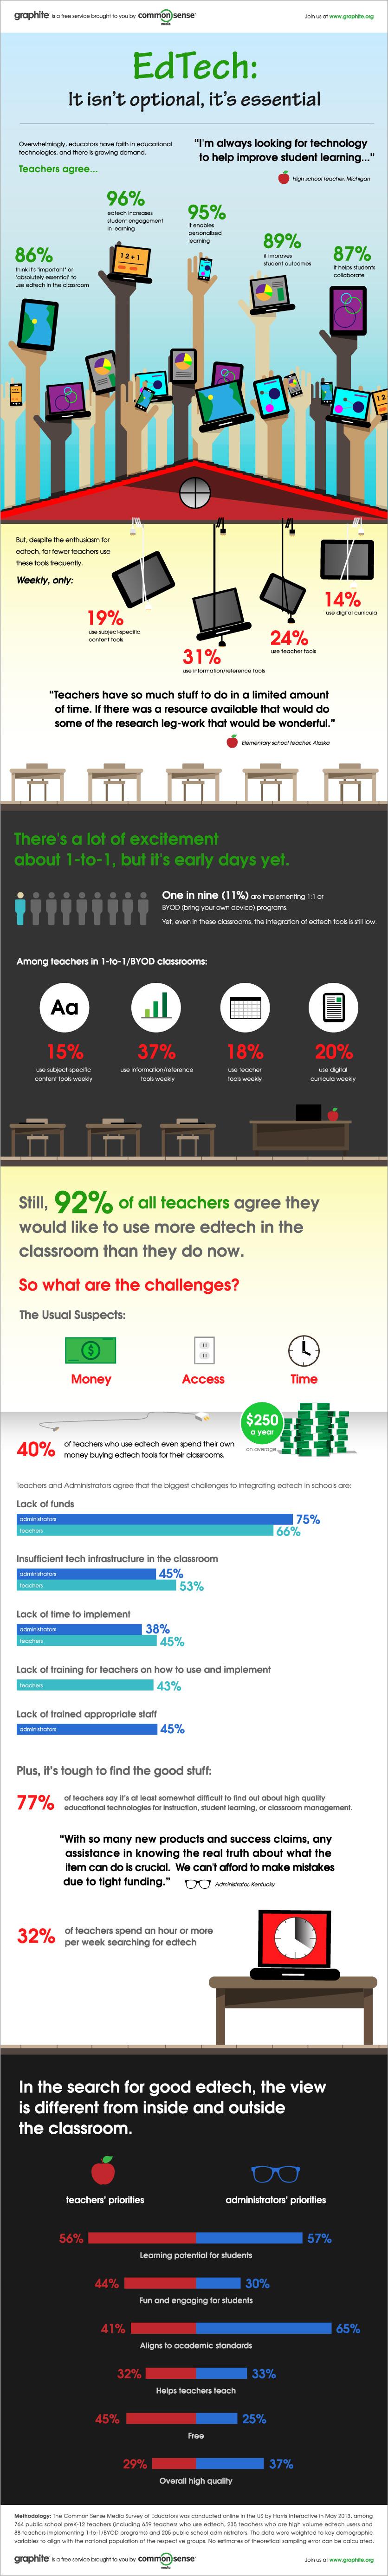 csm_infographic-062113-v3-web